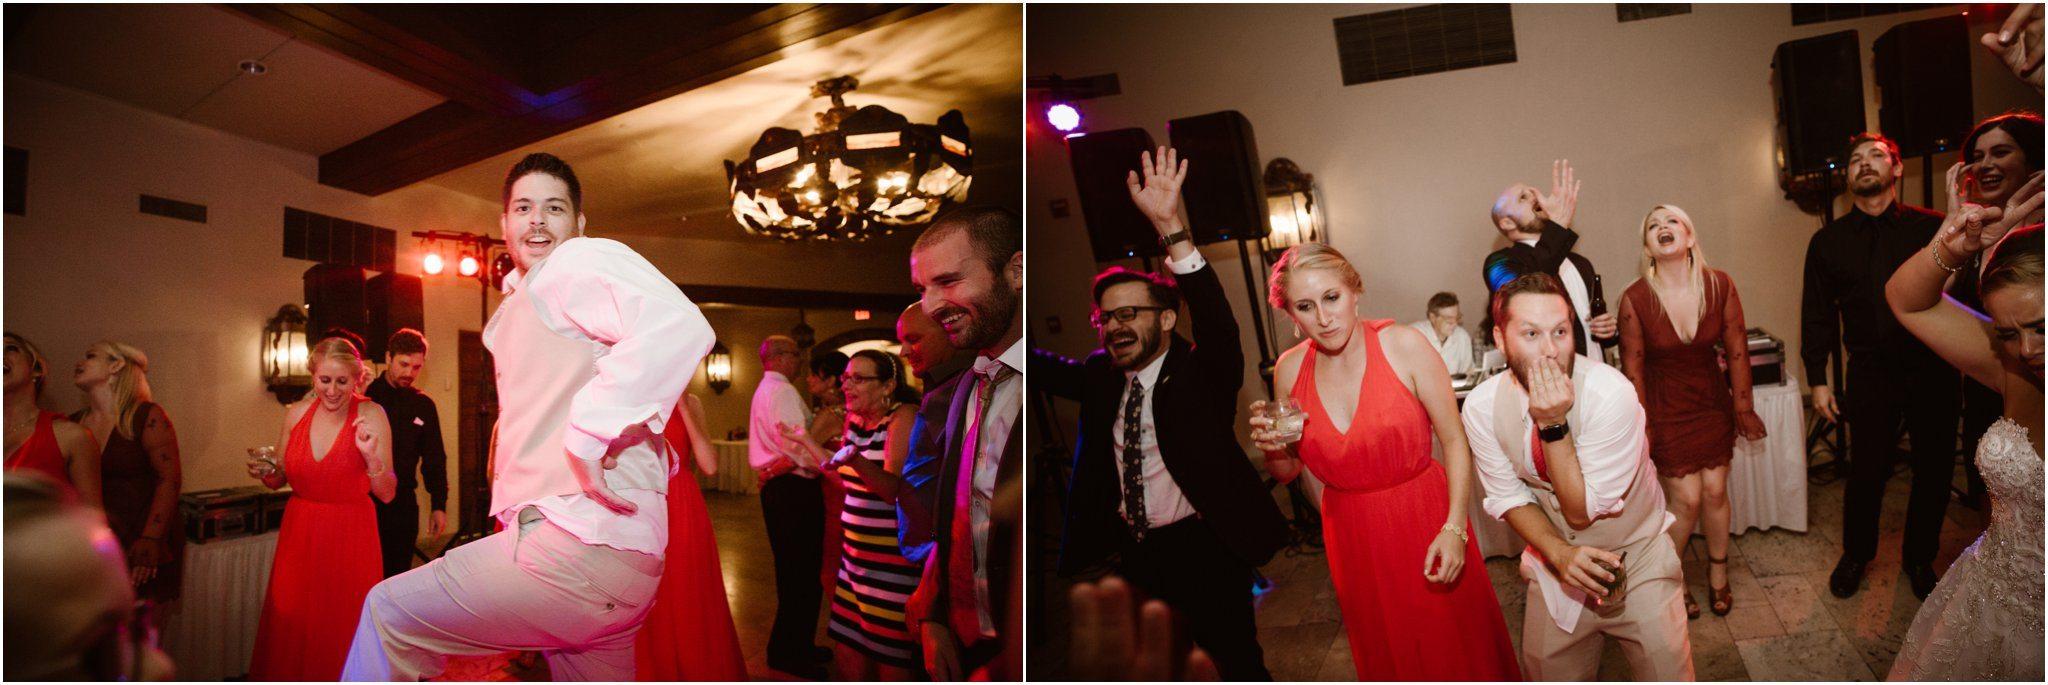 0094albuquerque-wedding-photographer_-santa-fe-wedding-photographer_-southwest-wedding-photography_-blue-rose-studio